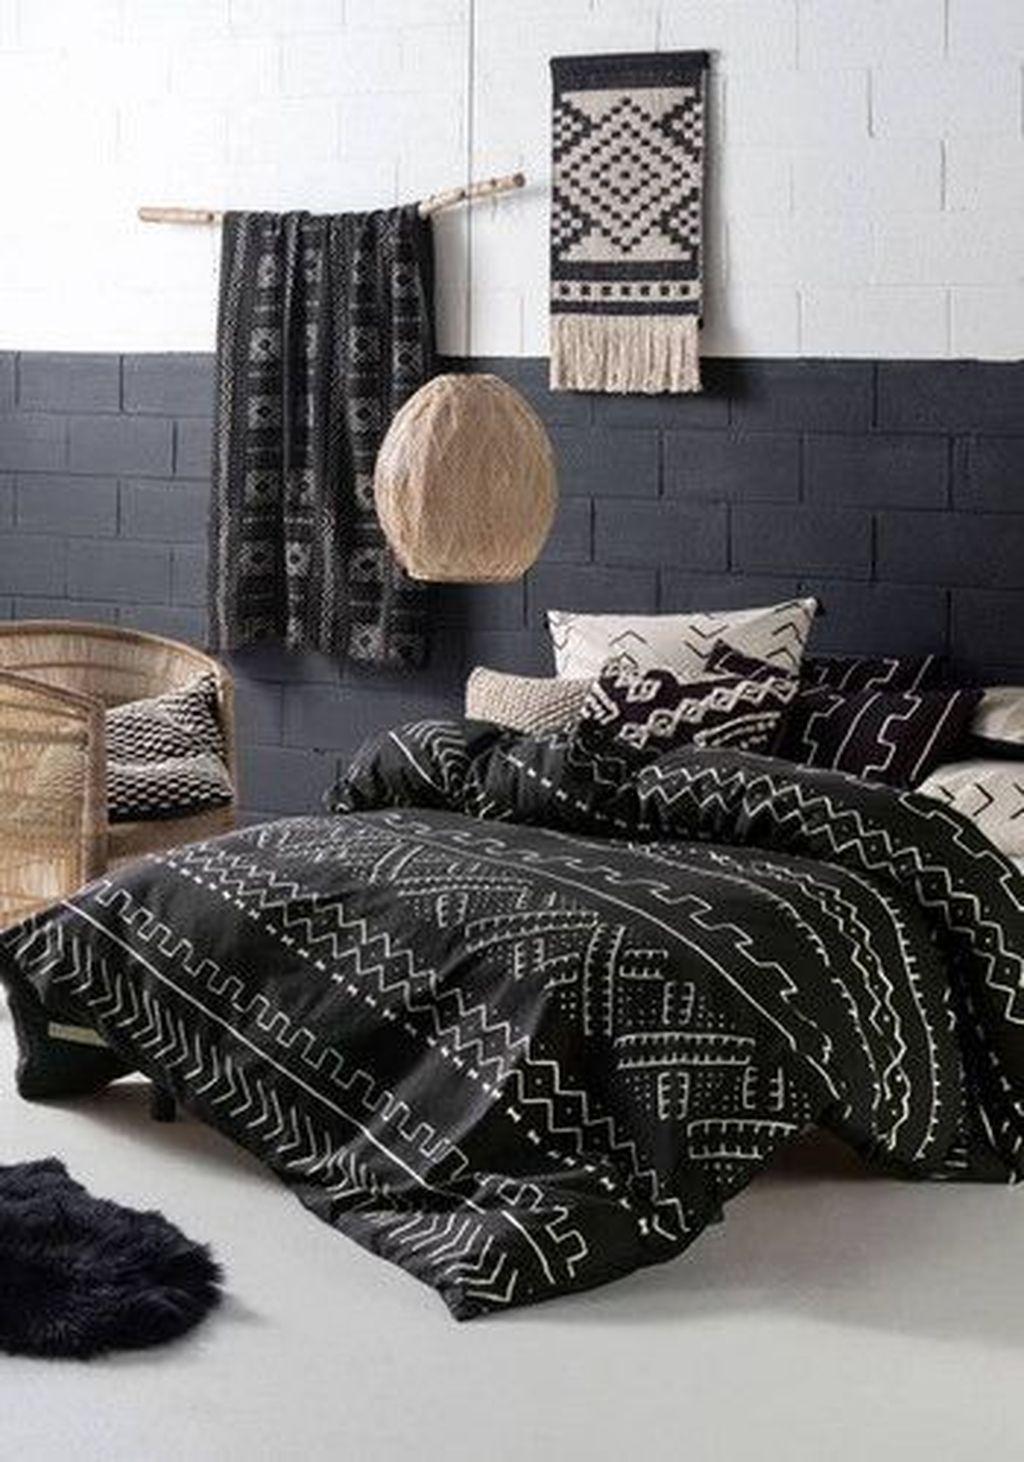 Superb Handmade Home Décor Ideas For Home Look Great 32